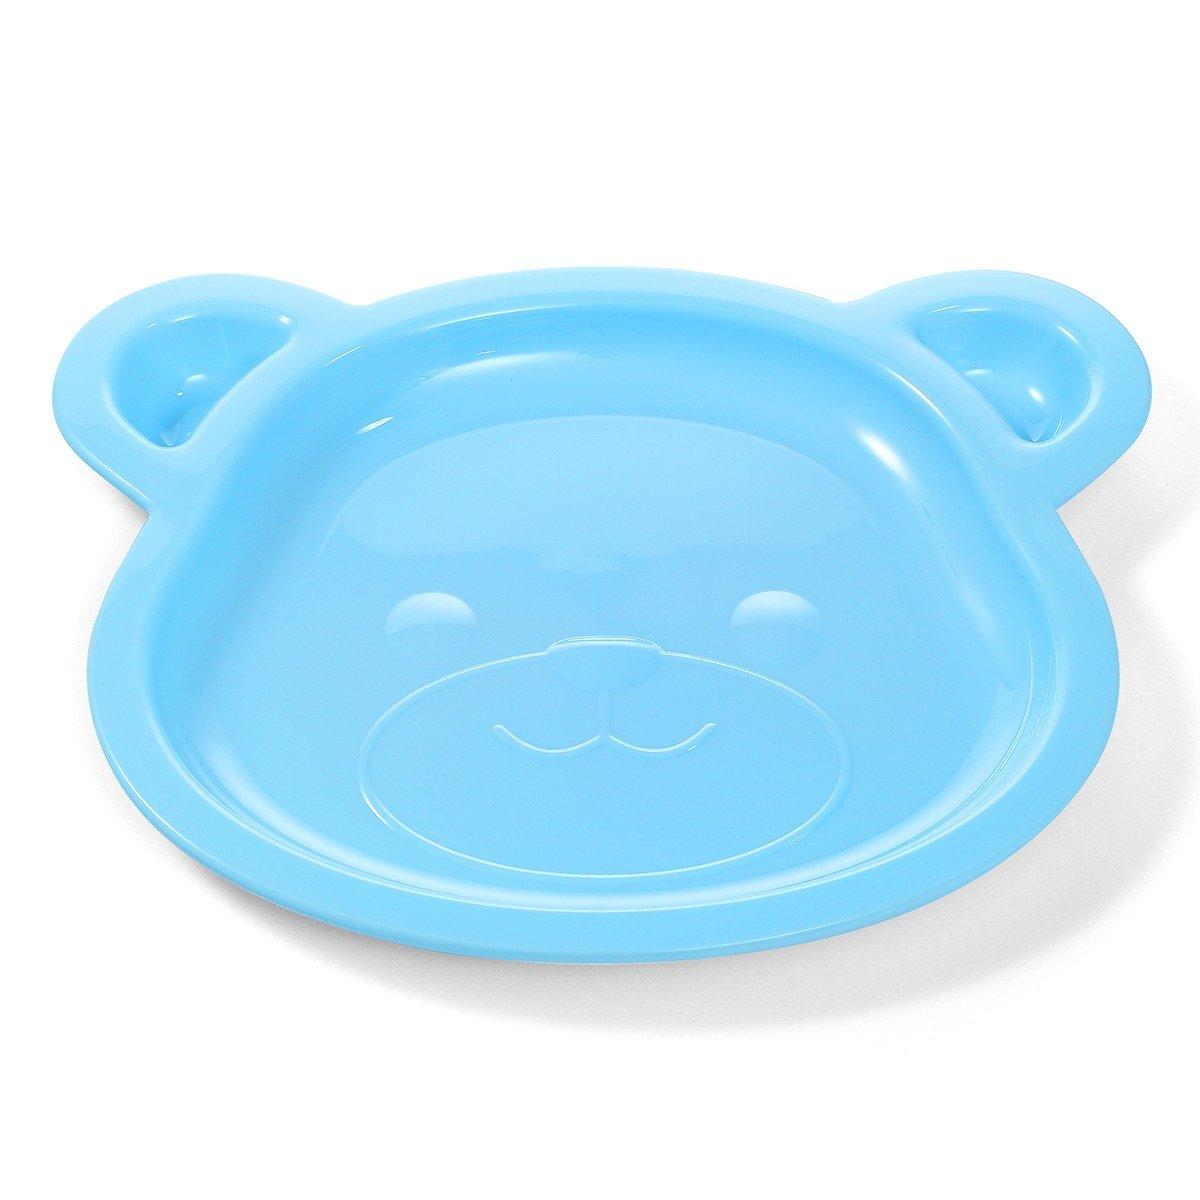 Dìtský talíø medvídek modrá